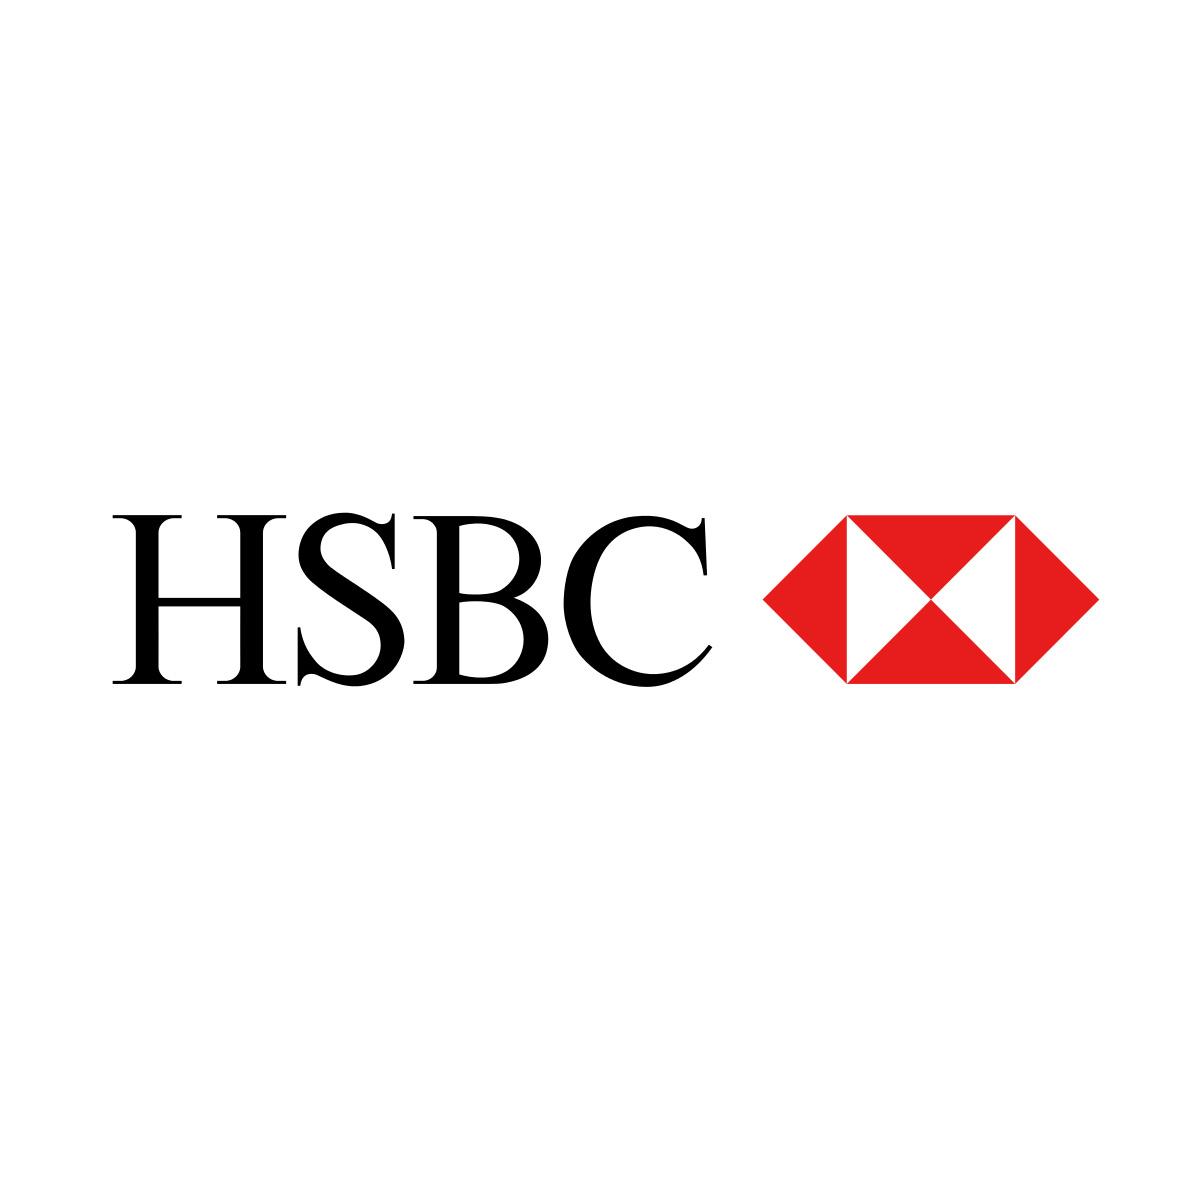 HSBC Bank Loan On Credit Card